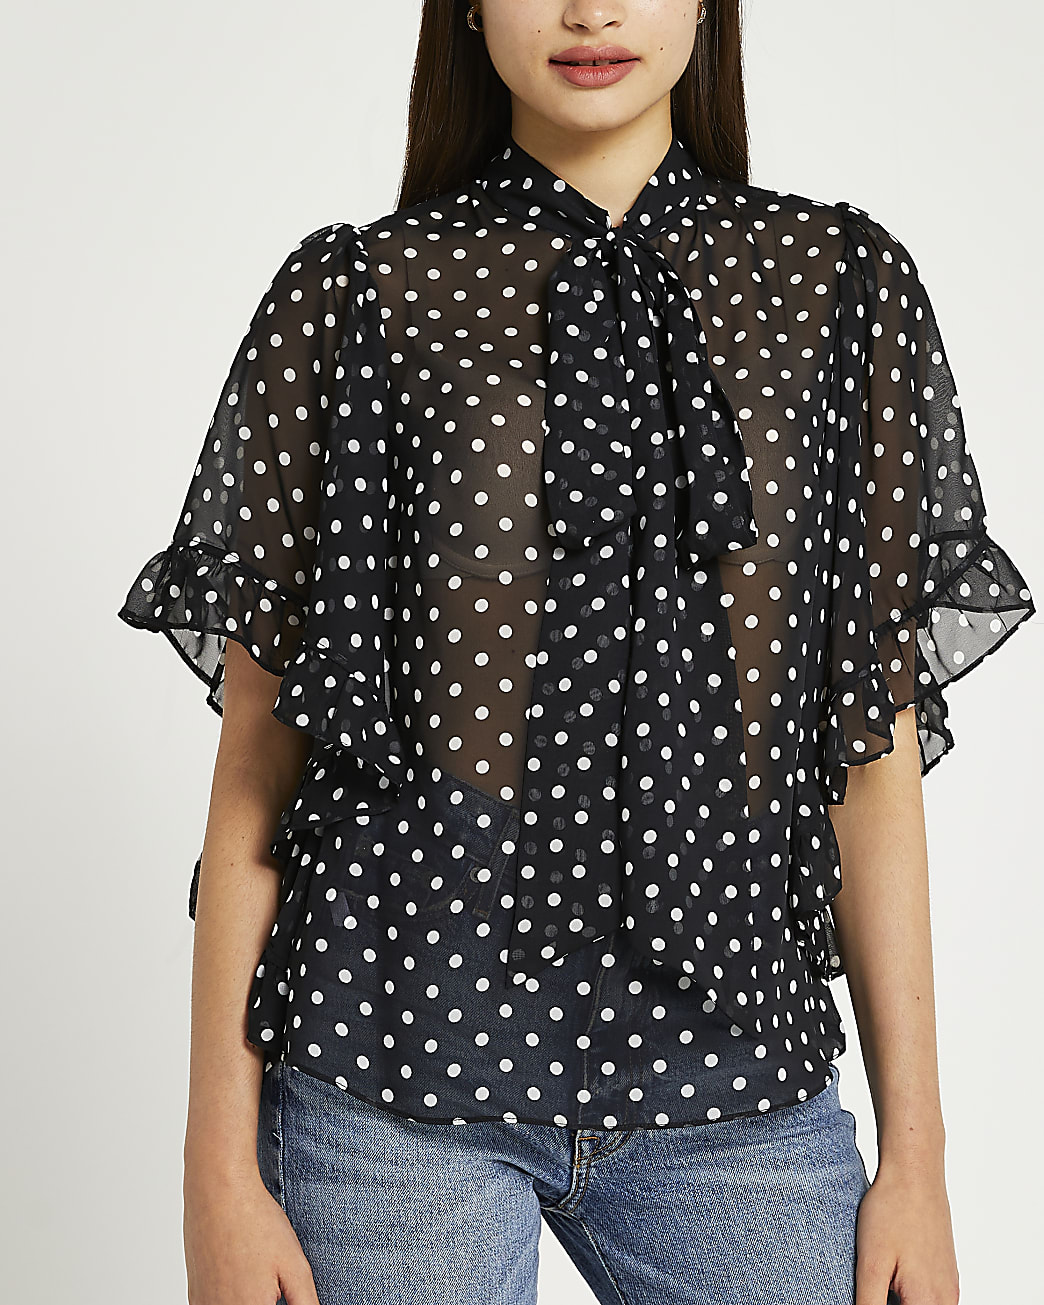 Black polka dot ruffled blouse